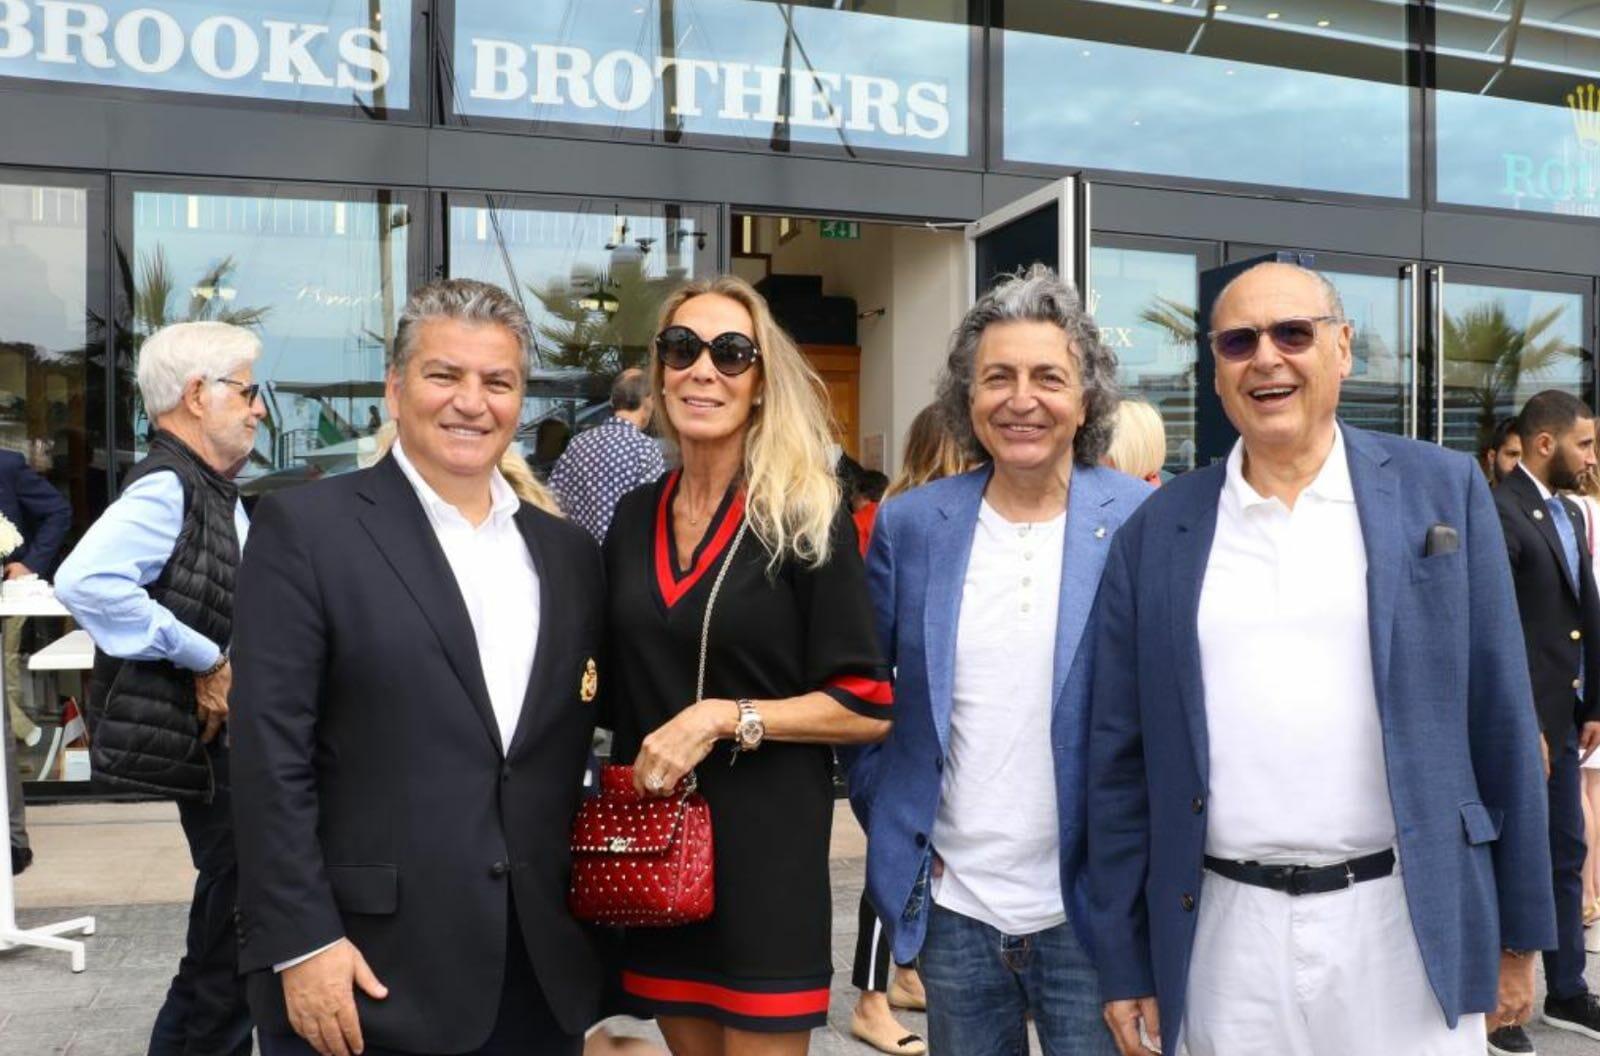 Завтрак c Brooks Brothers в Яхт-клубе Монако